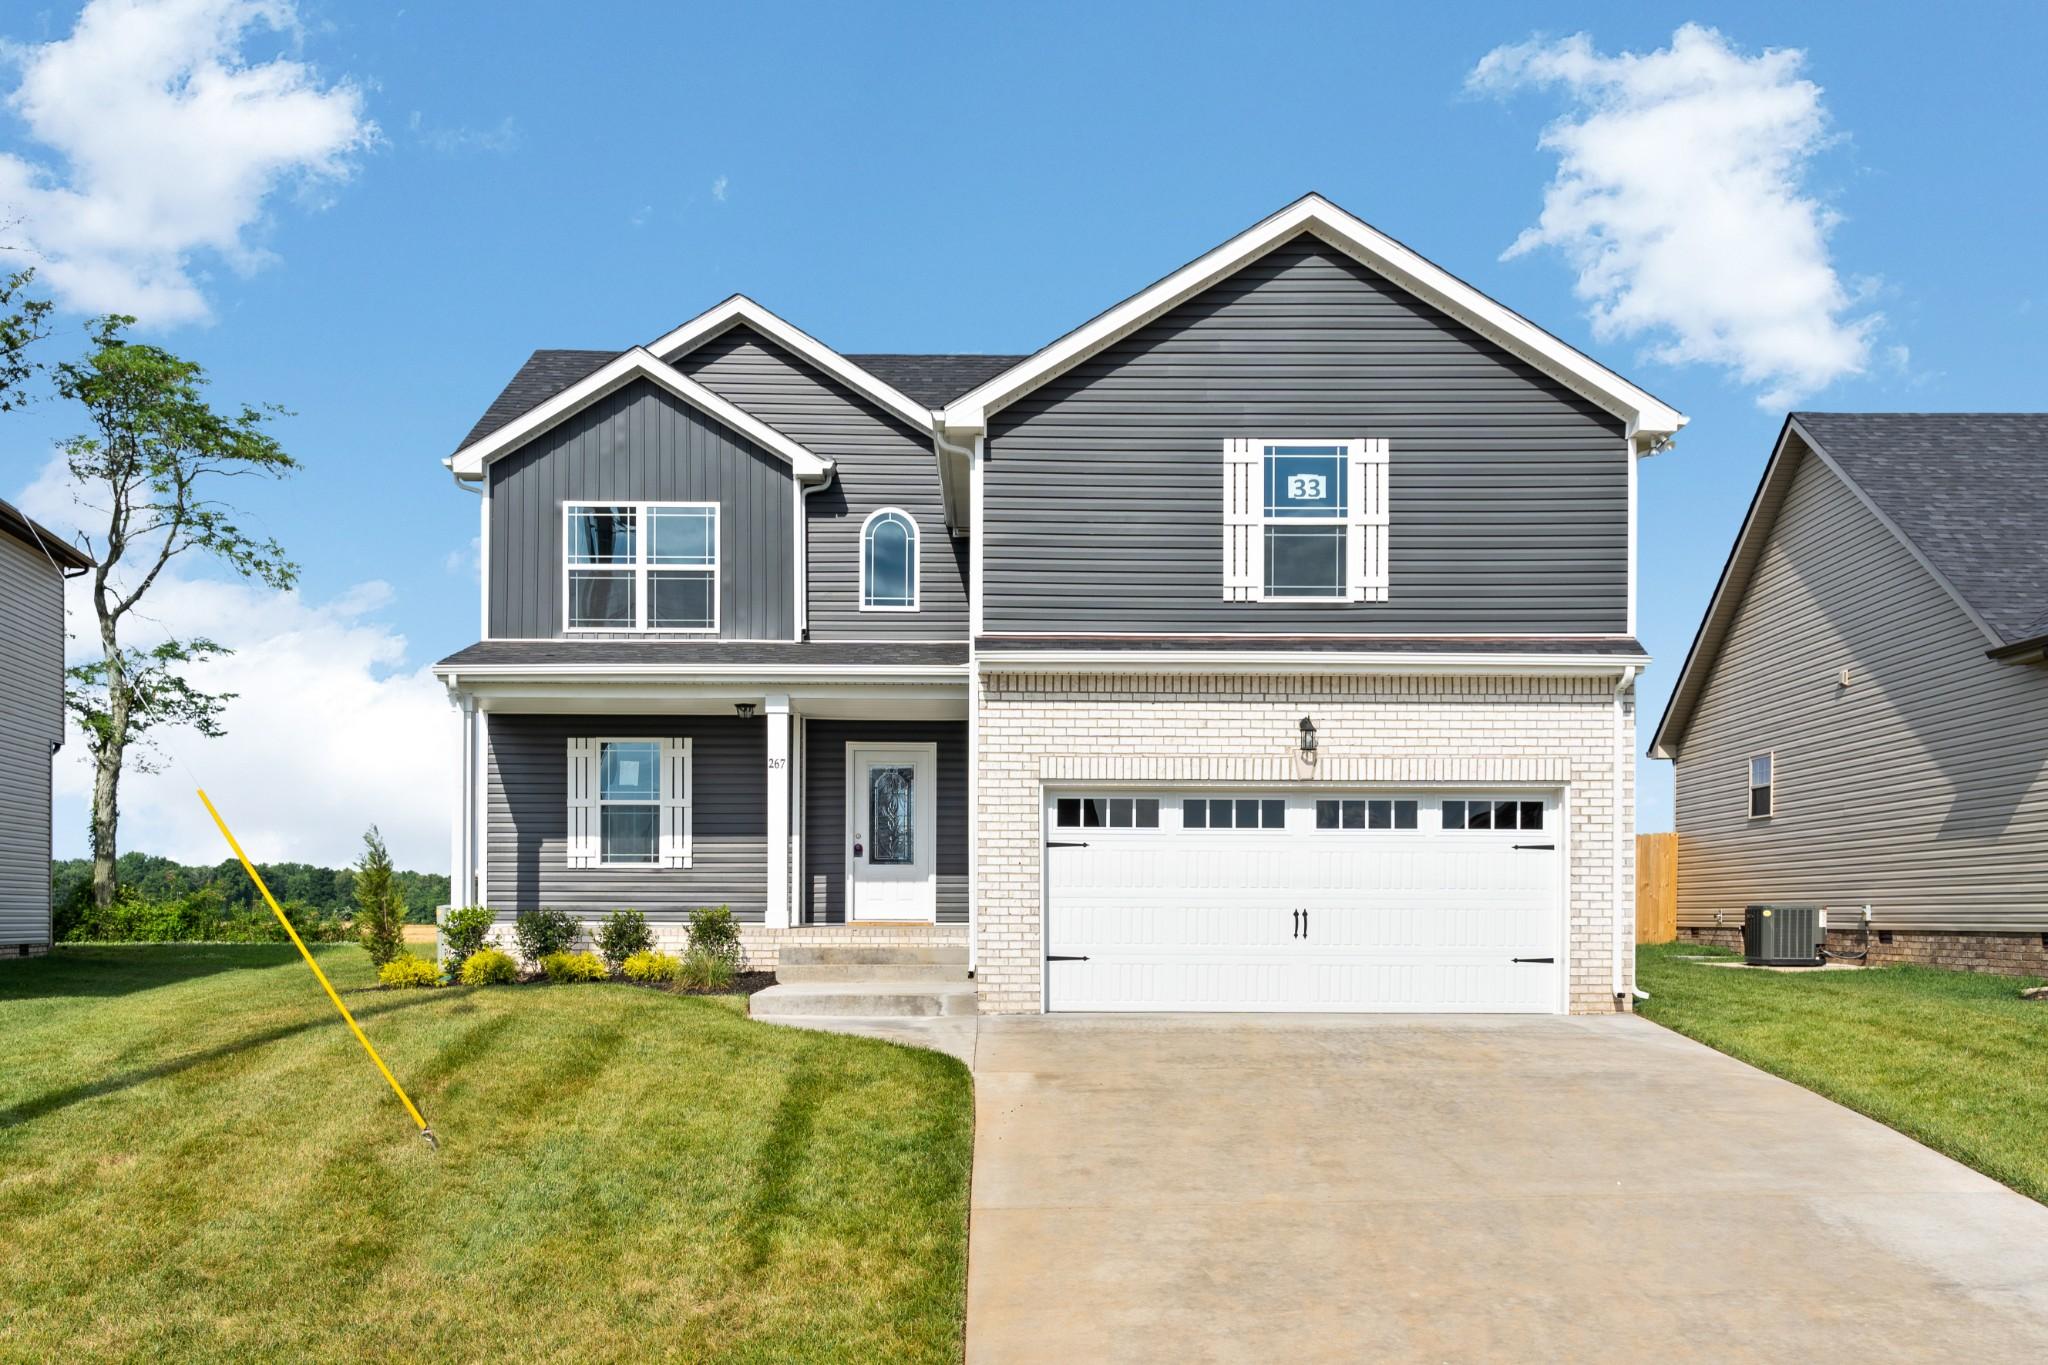 33 Rose Edd Property Photo - Oak Grove, KY real estate listing